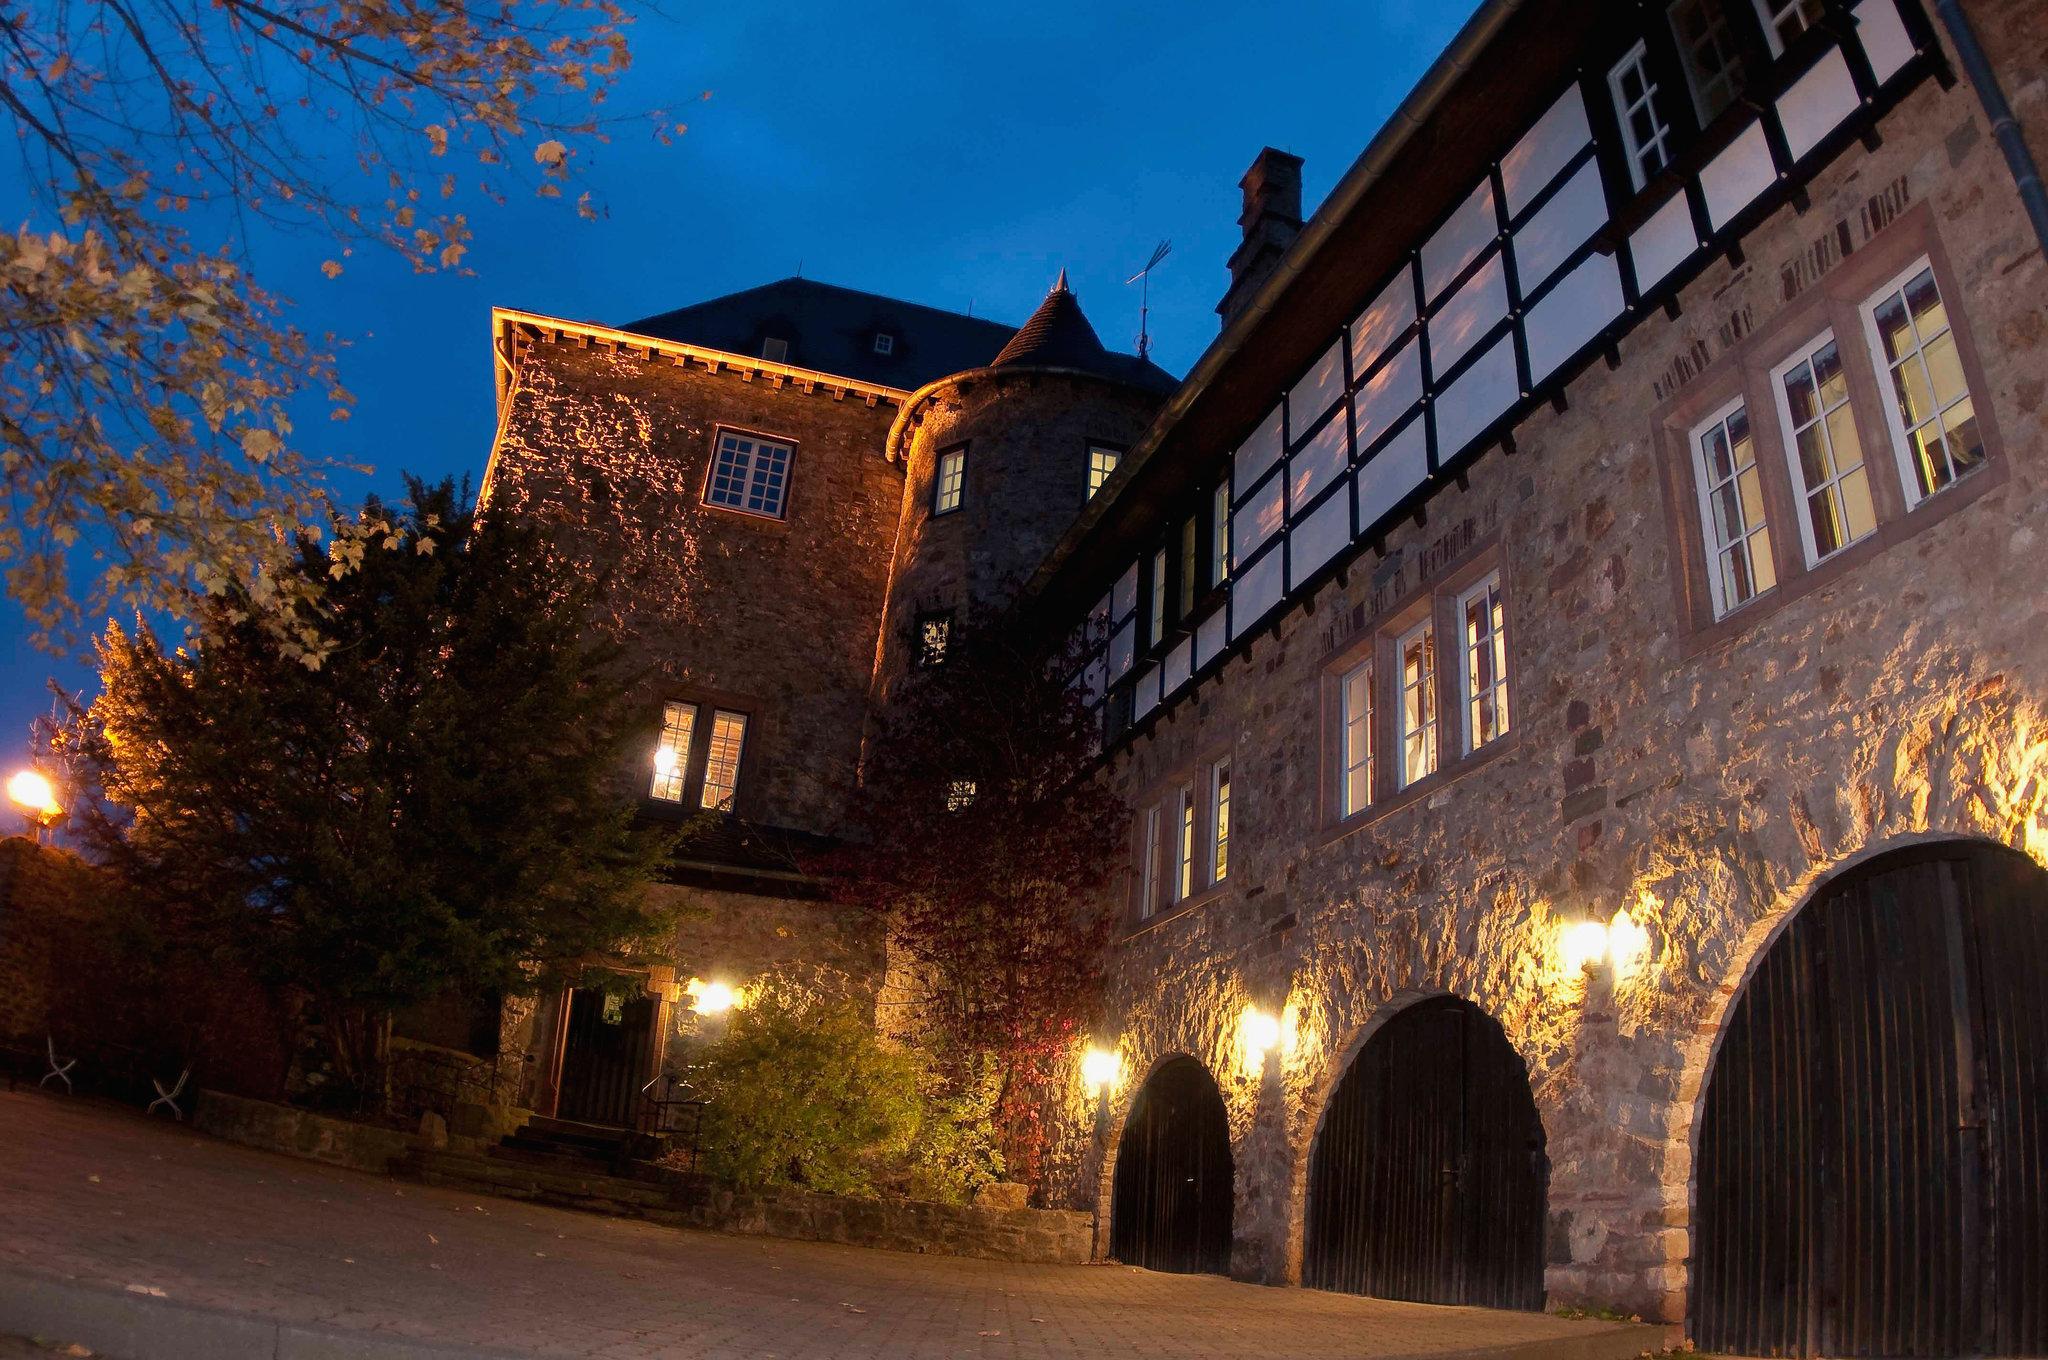 Abendstimmung auf Burg Blankenheim (Foto:DJH Rheinland e.V.)